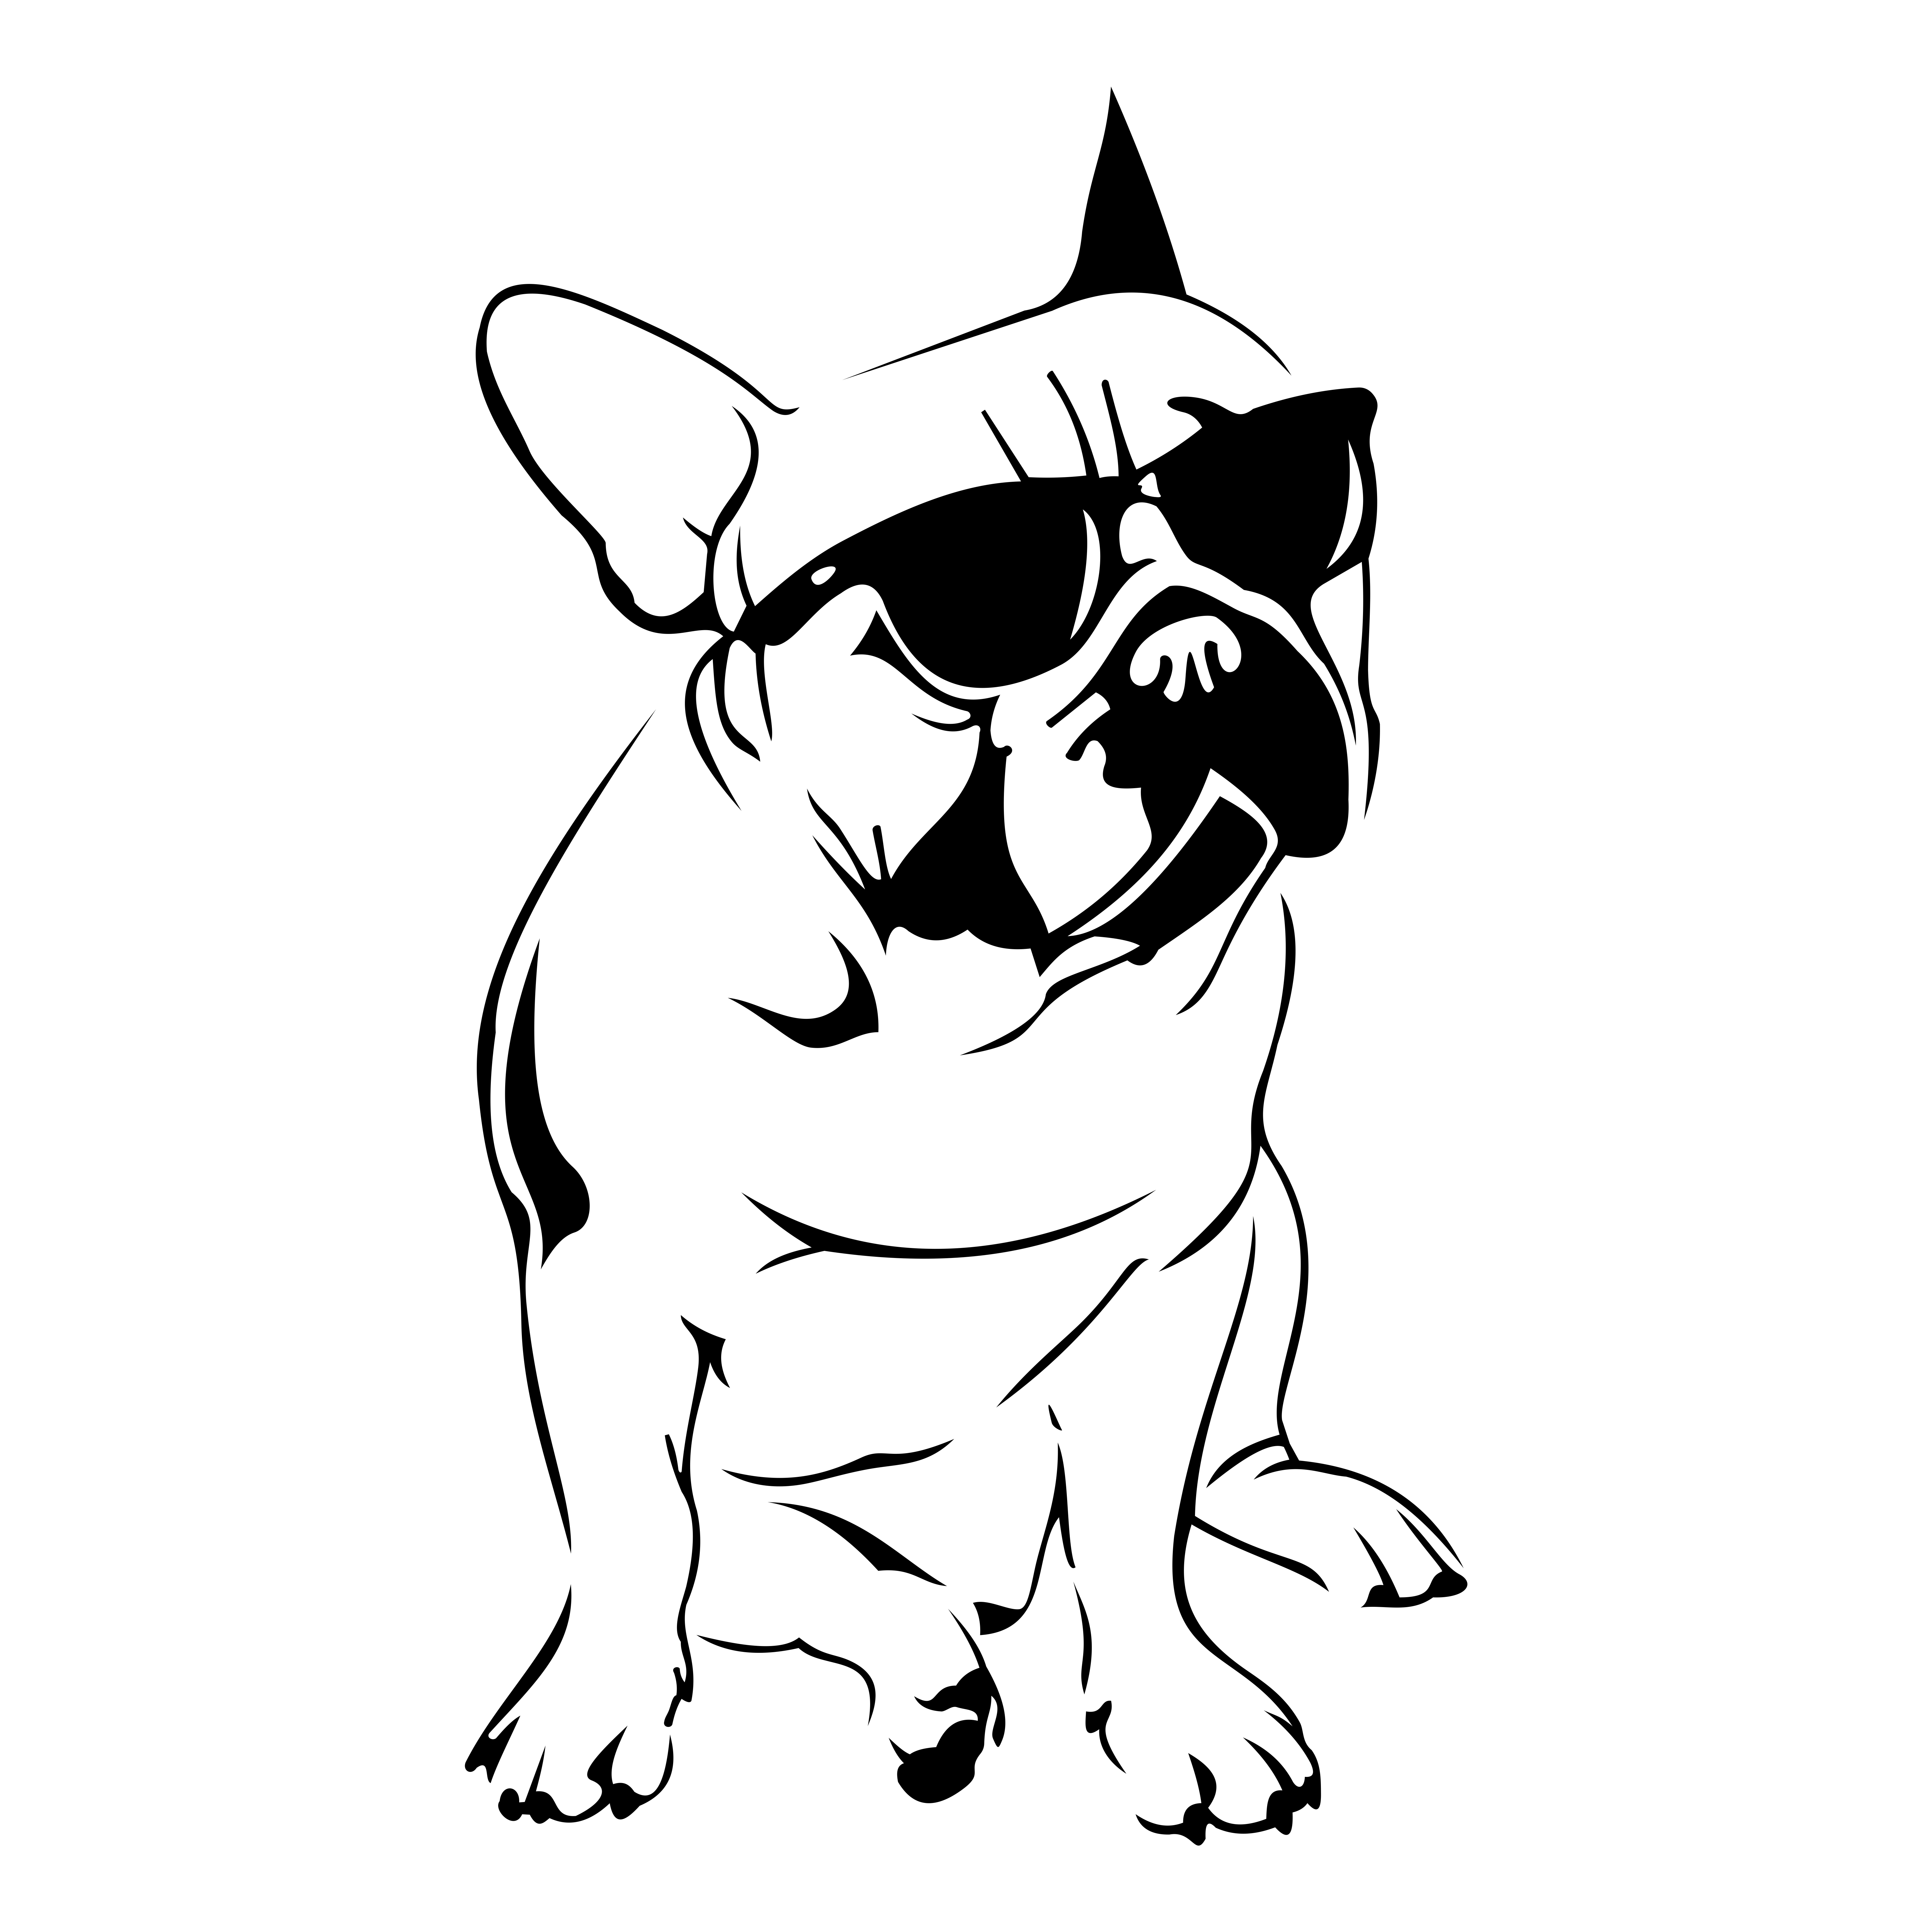 French Bulldog Design SVG DXF .-French Bulldog Design SVG DXF .-4